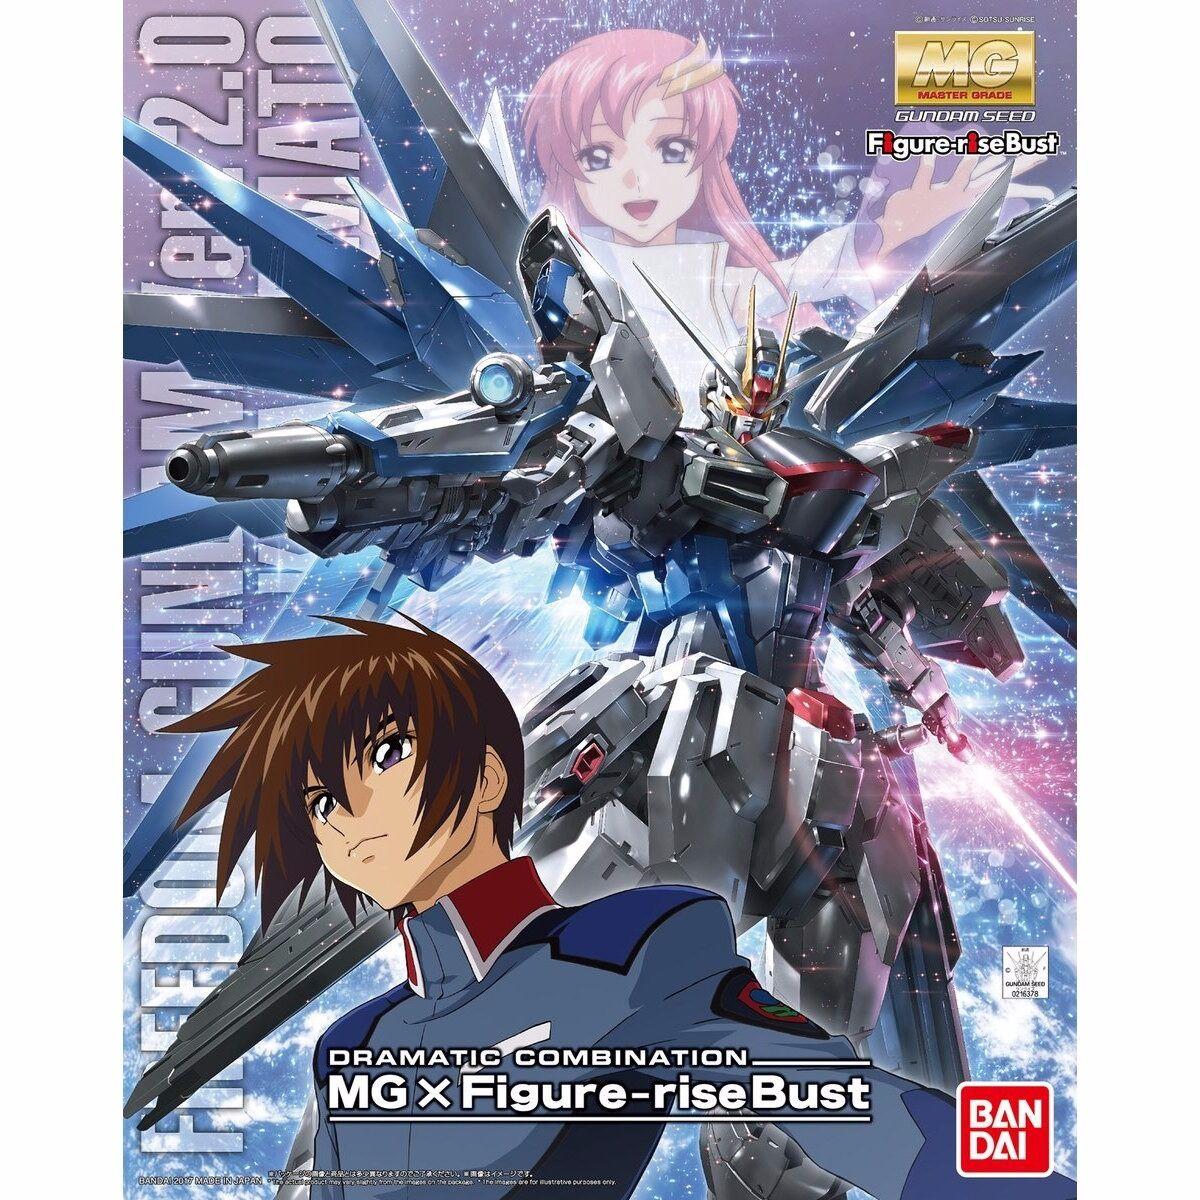 Beai Drammatico Combinazione gratuitodom Gundam 2.0 & cifra-Rise autobusto Kira Kit